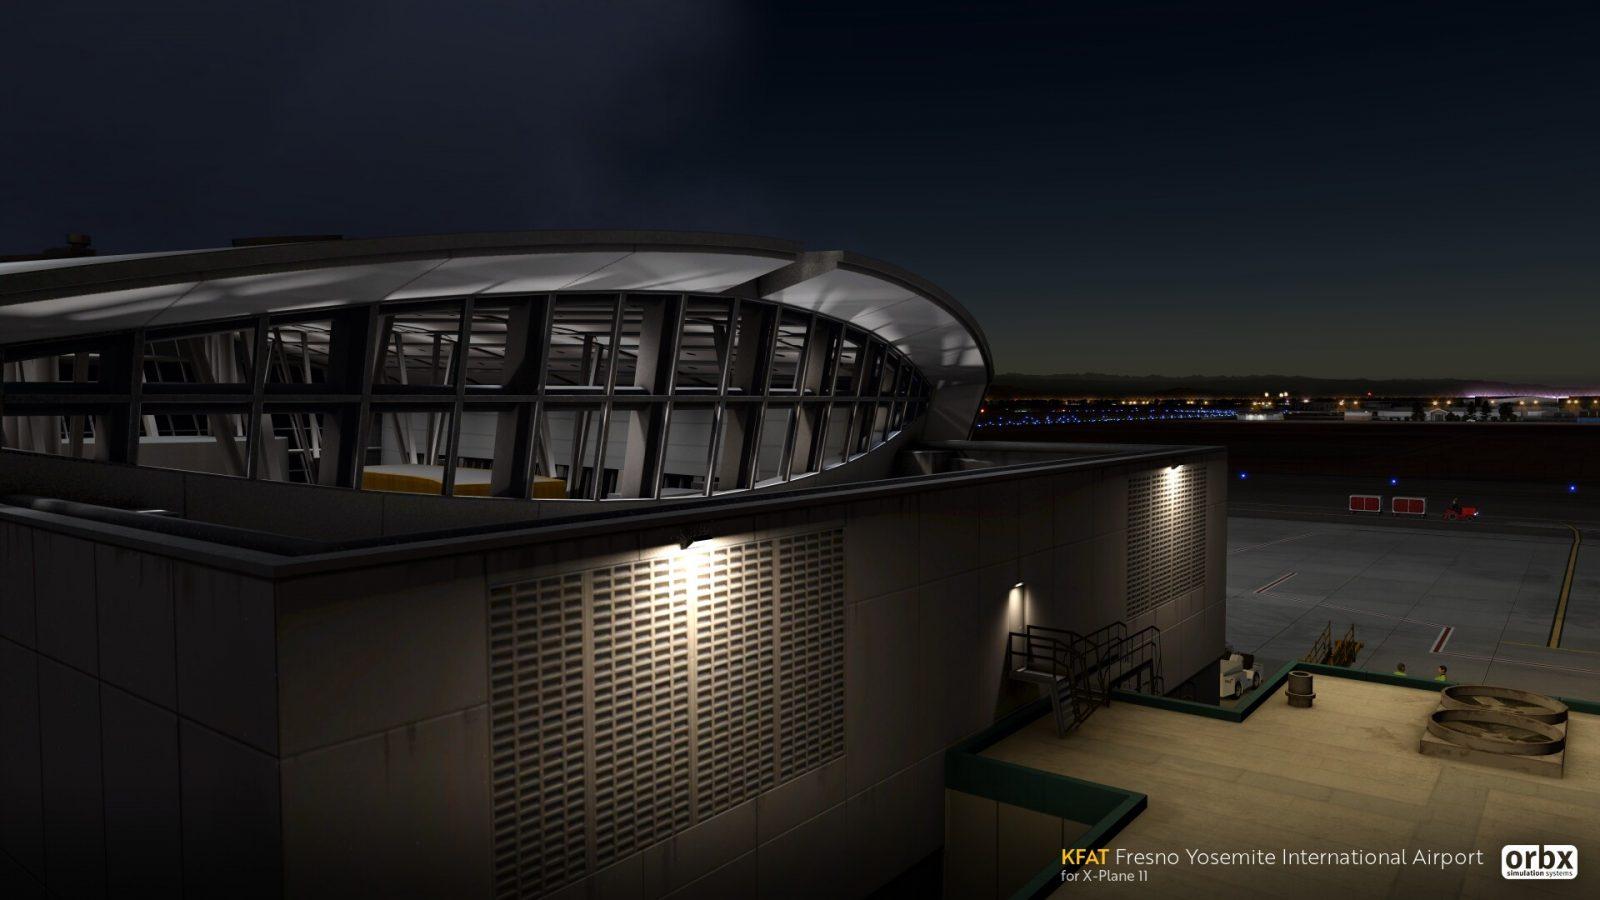 Orbx Releases Fresno Yosemite Airport (KFAT) For X-Plane